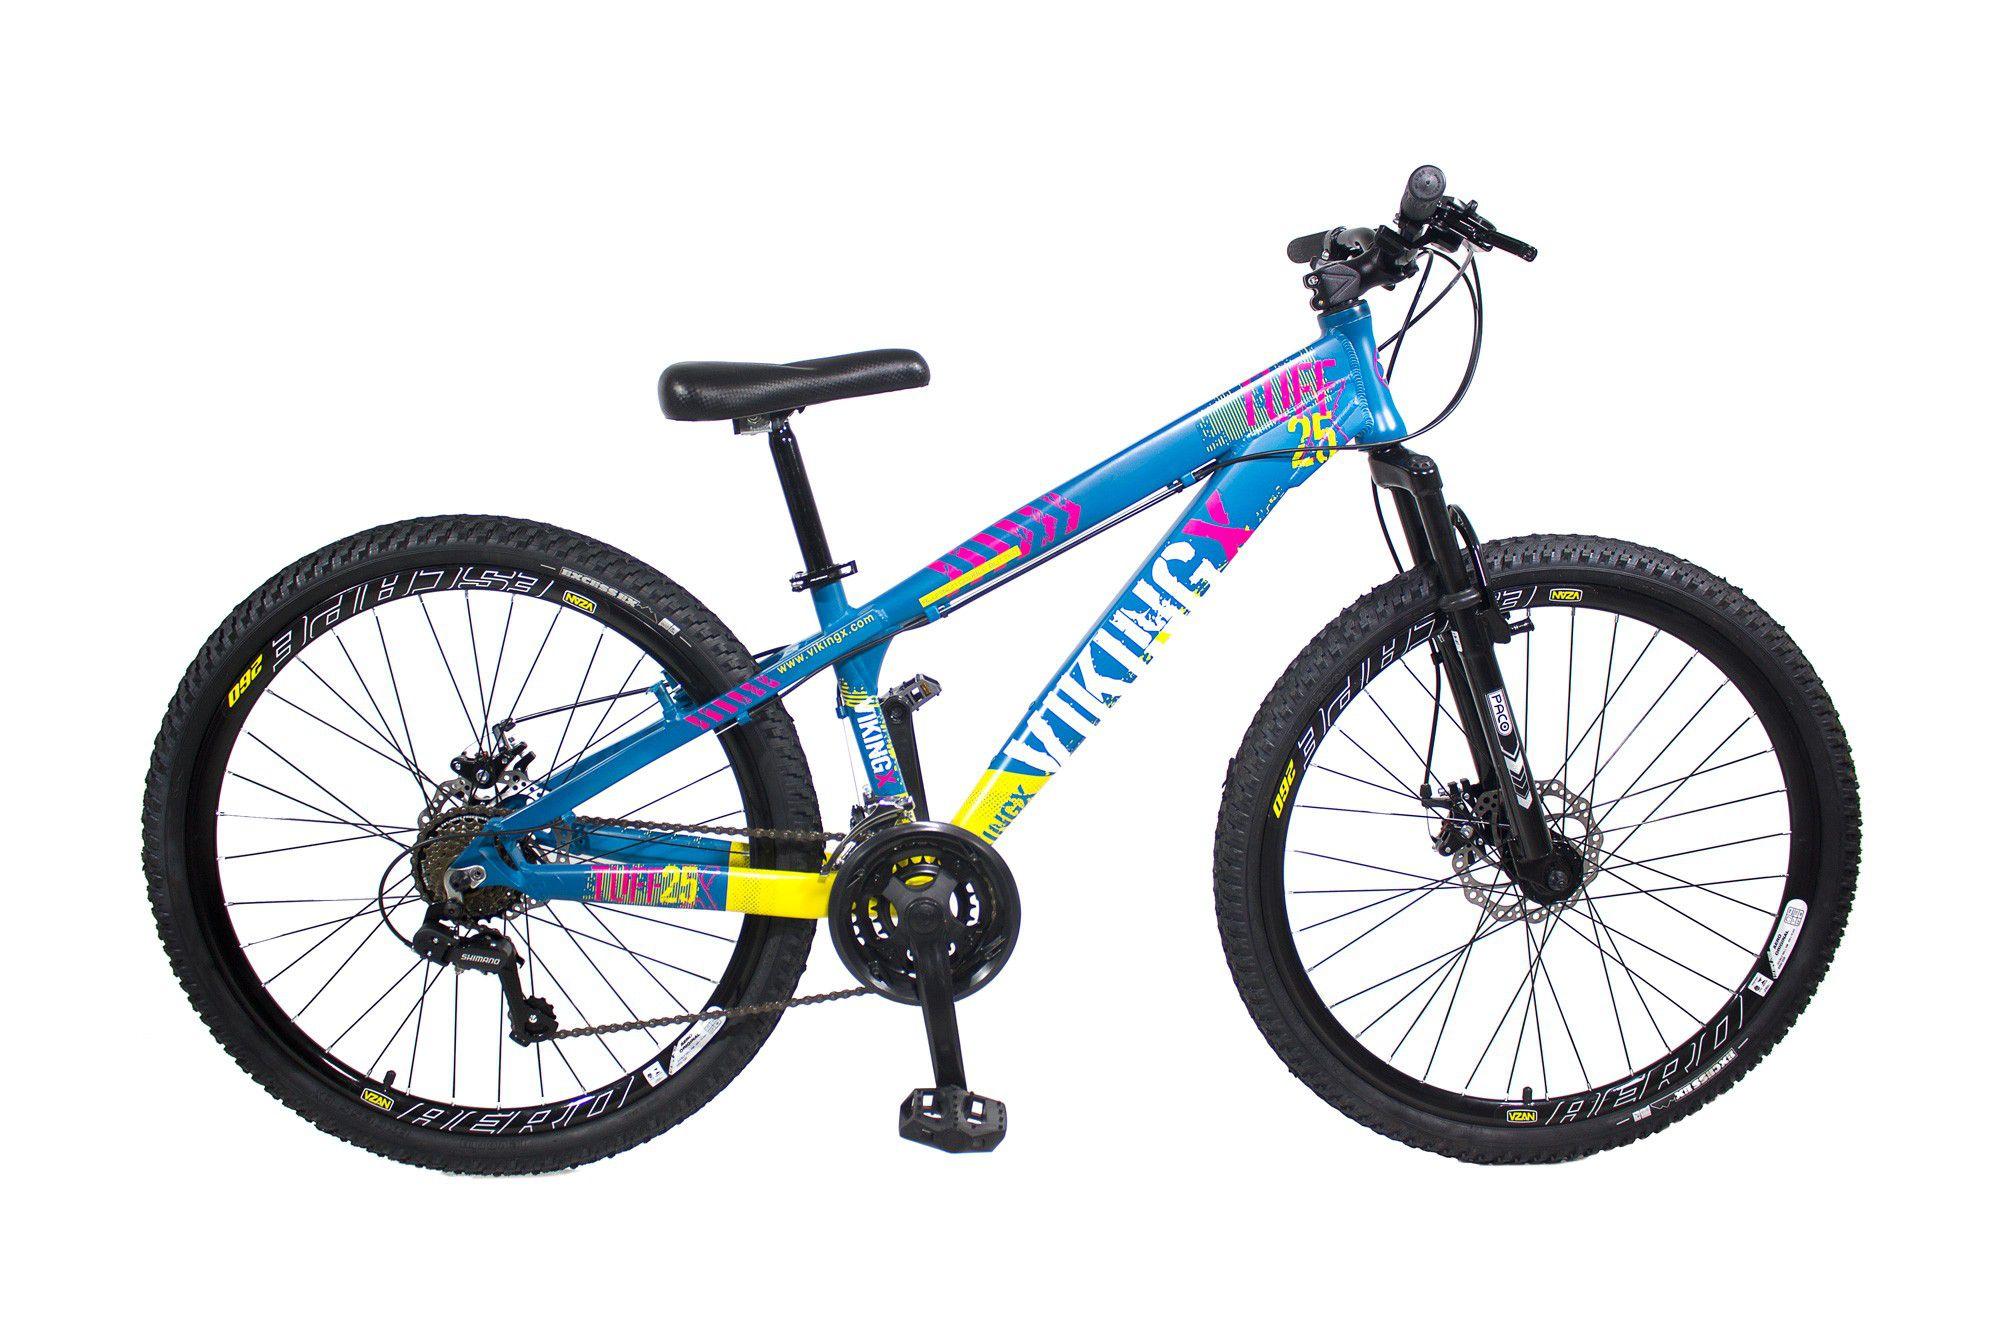 Bicicleta Vikingx Tuff X25 Shimano Freio A Disco Hidraulico Azul/Amarelo